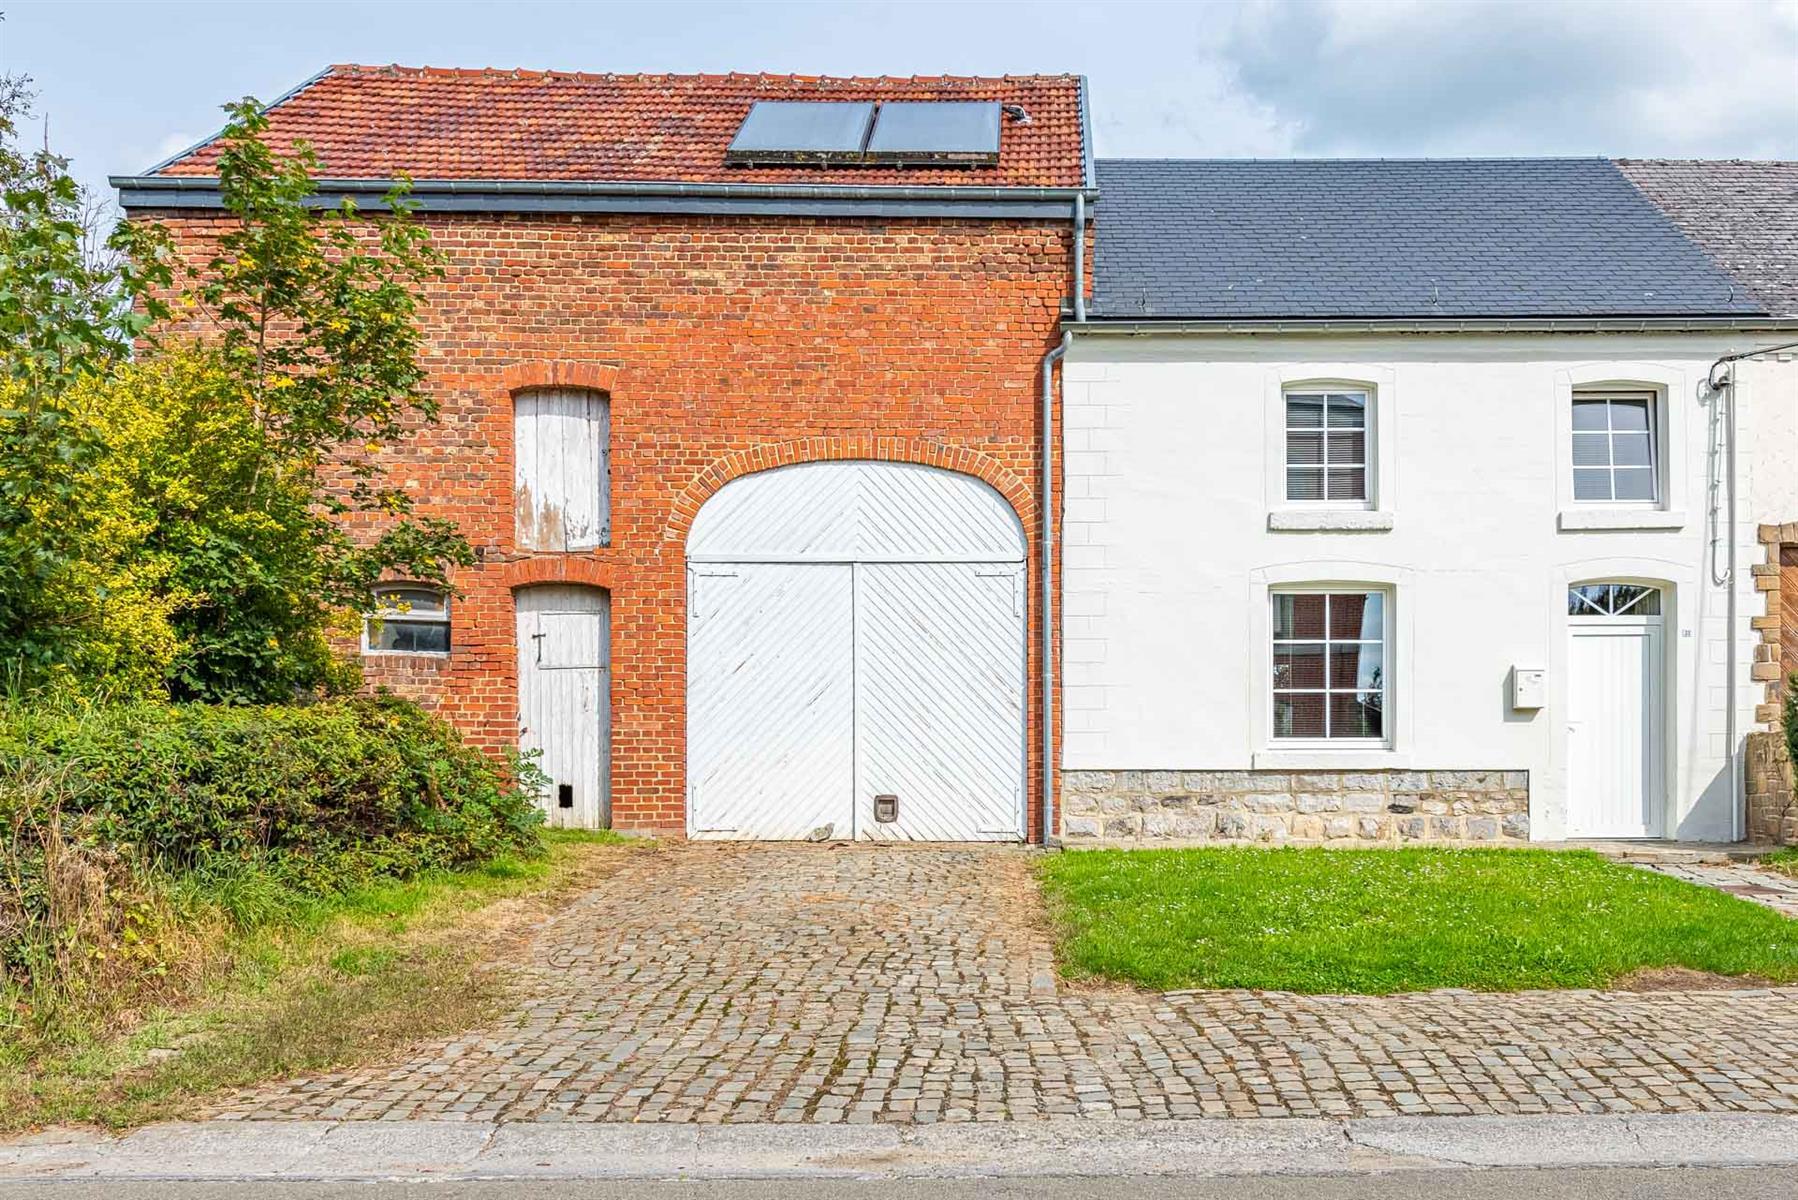 Maison - Houyet Wanlin - #4496629-0